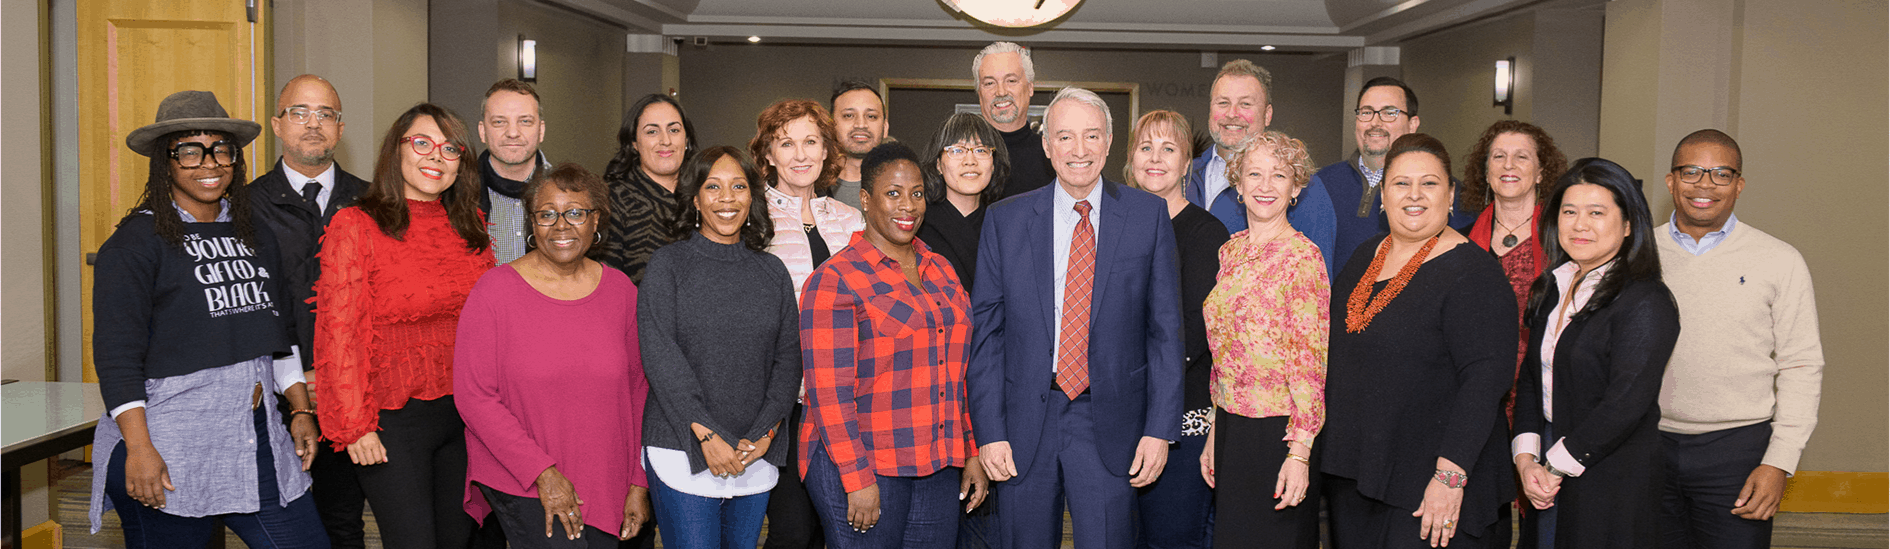 2020 Board of Directors by Adam Kissick/APAP